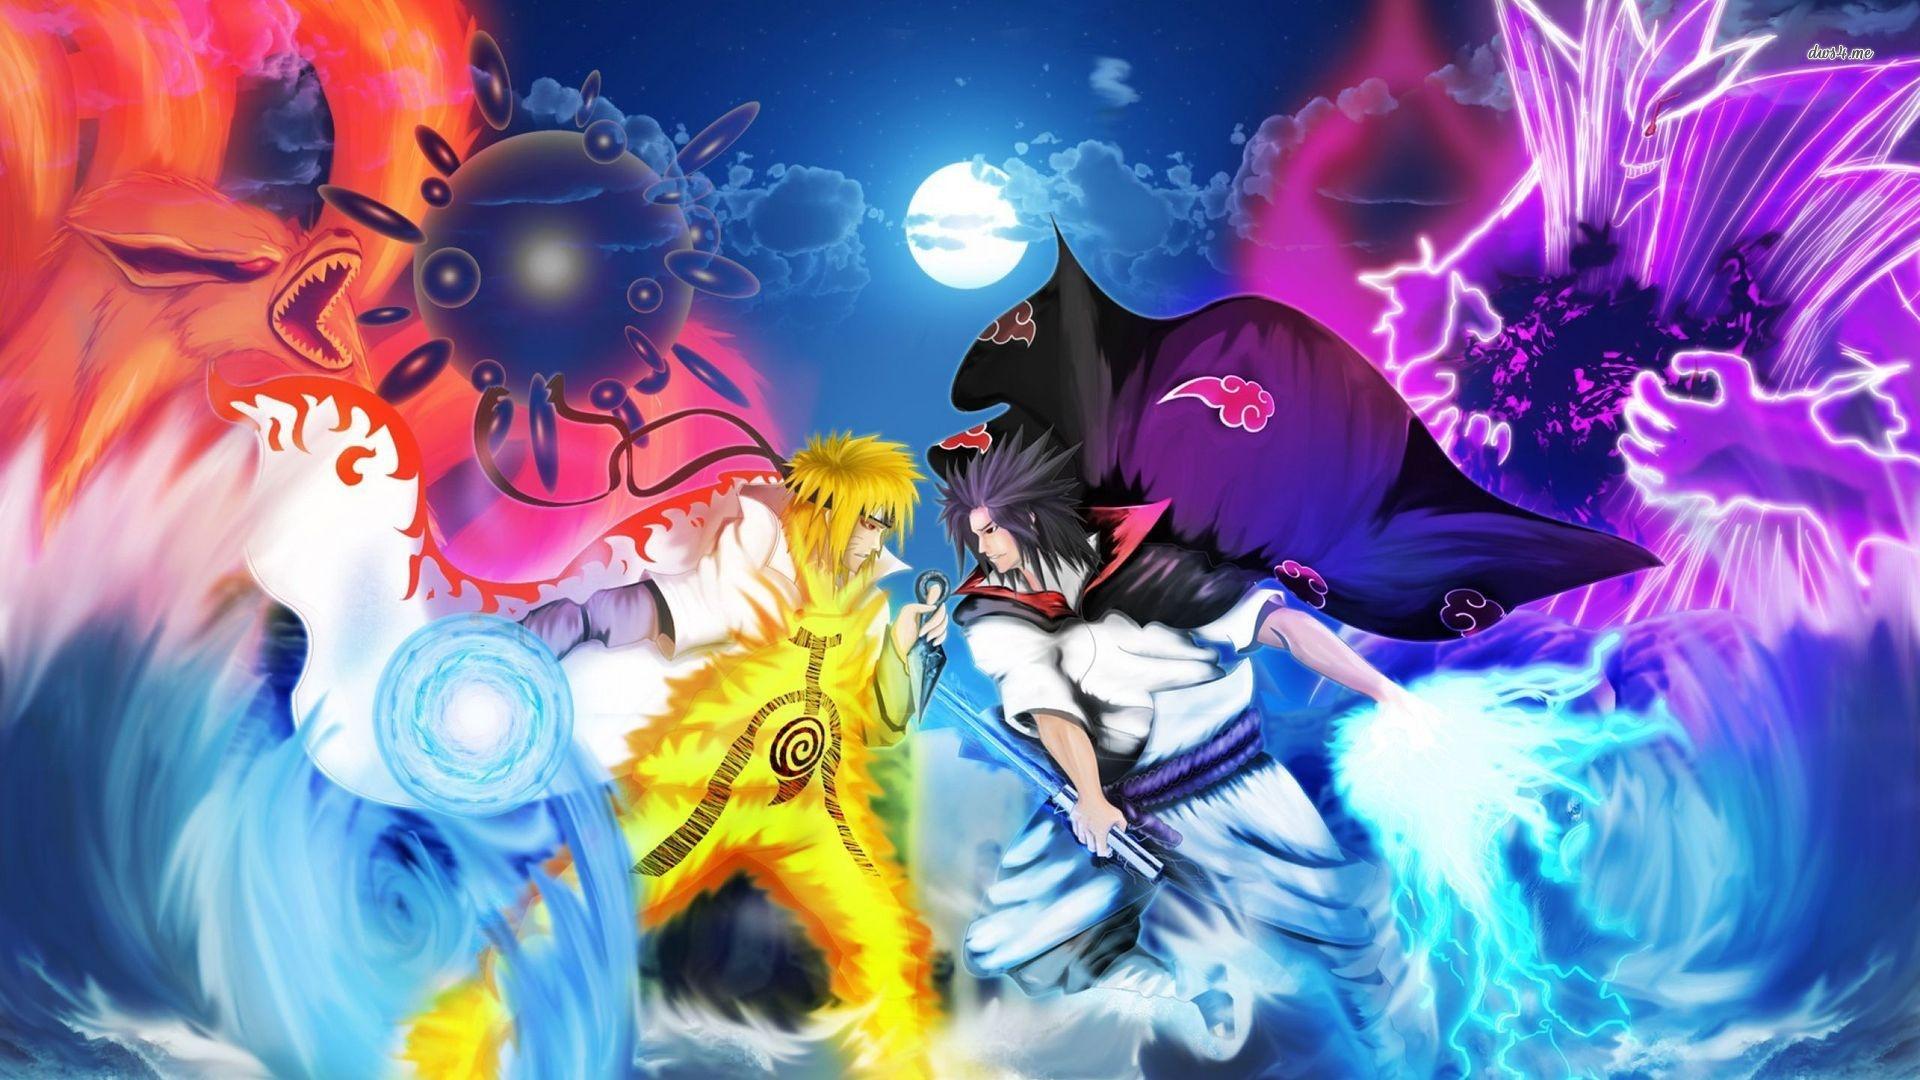 Naruto windows background